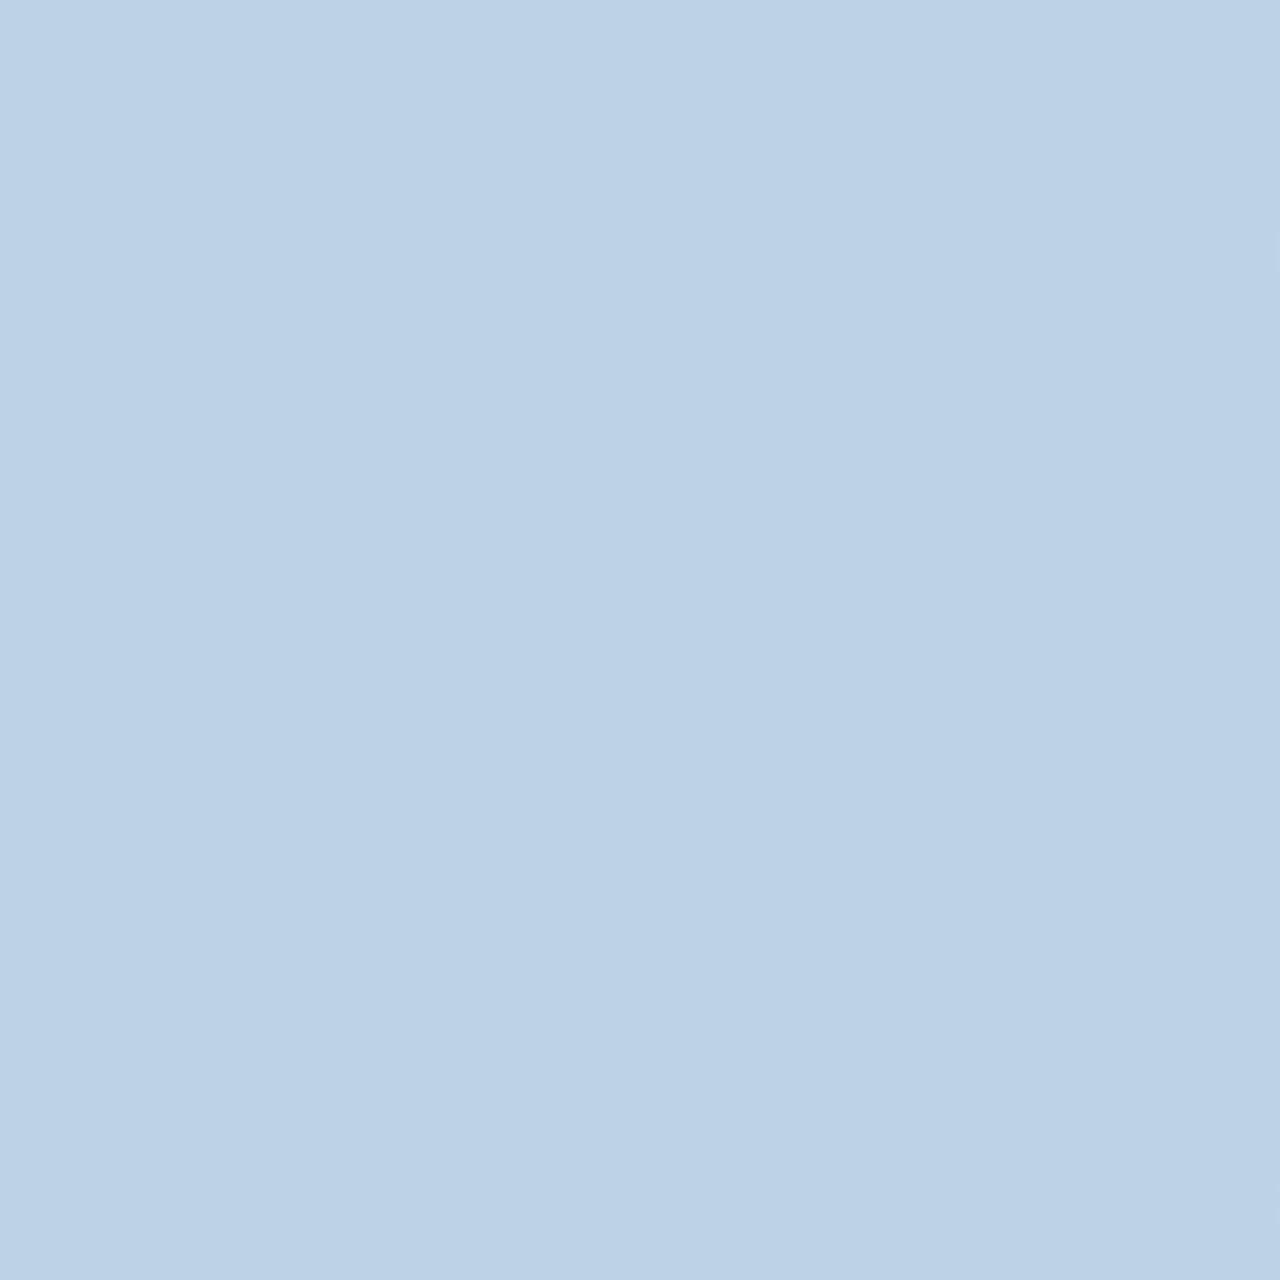 Lee Gels Sheet #203 Qtr C.T.Blue